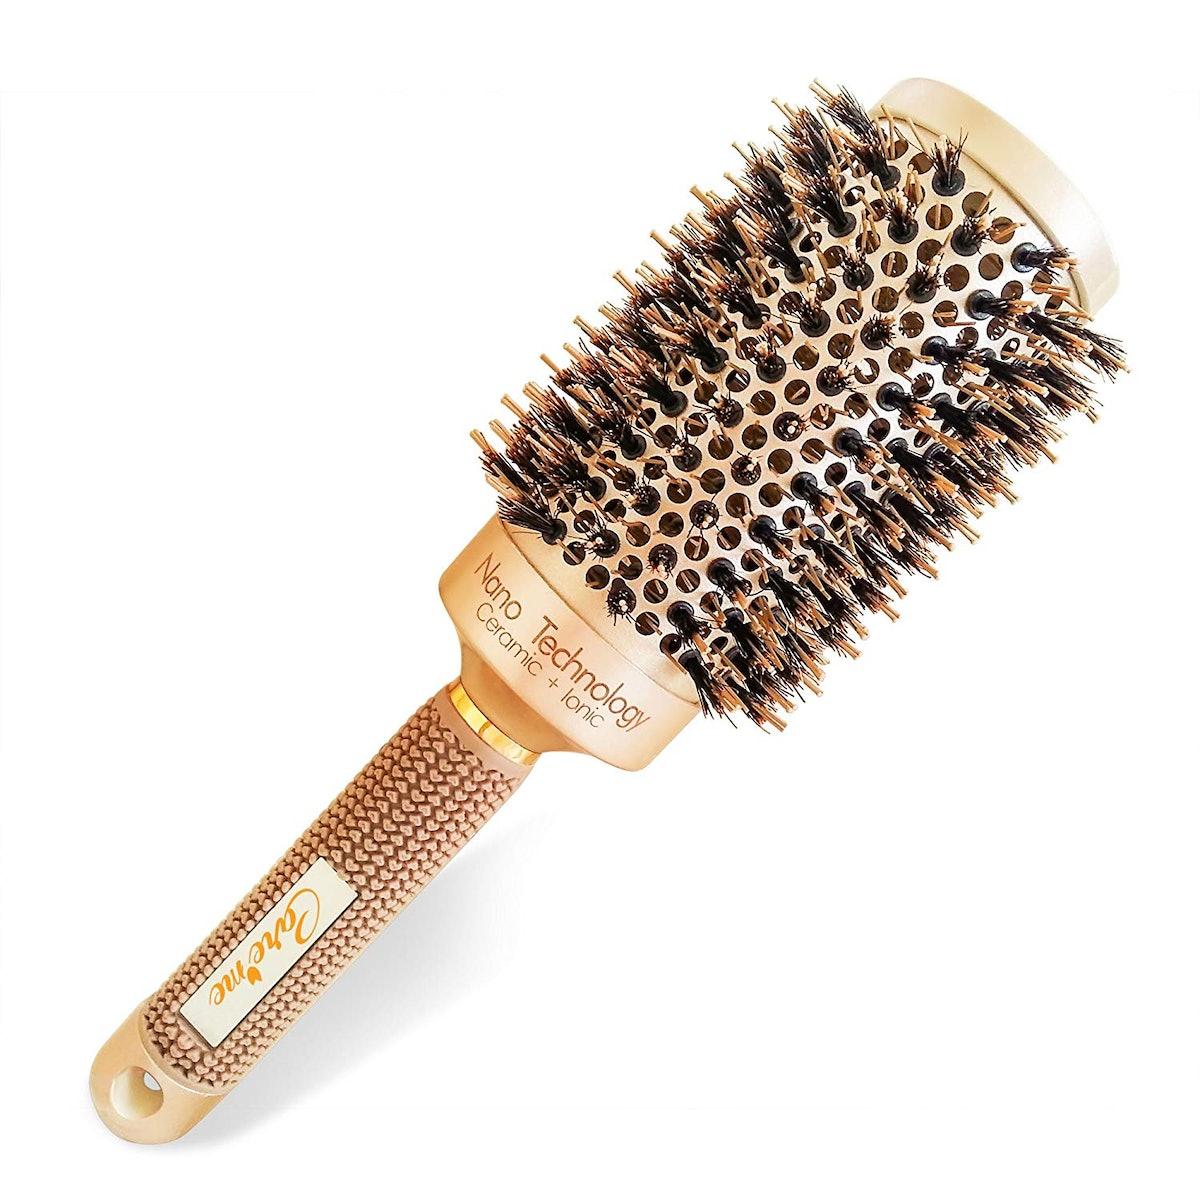 CareMe Boar Bristle Hairbrush